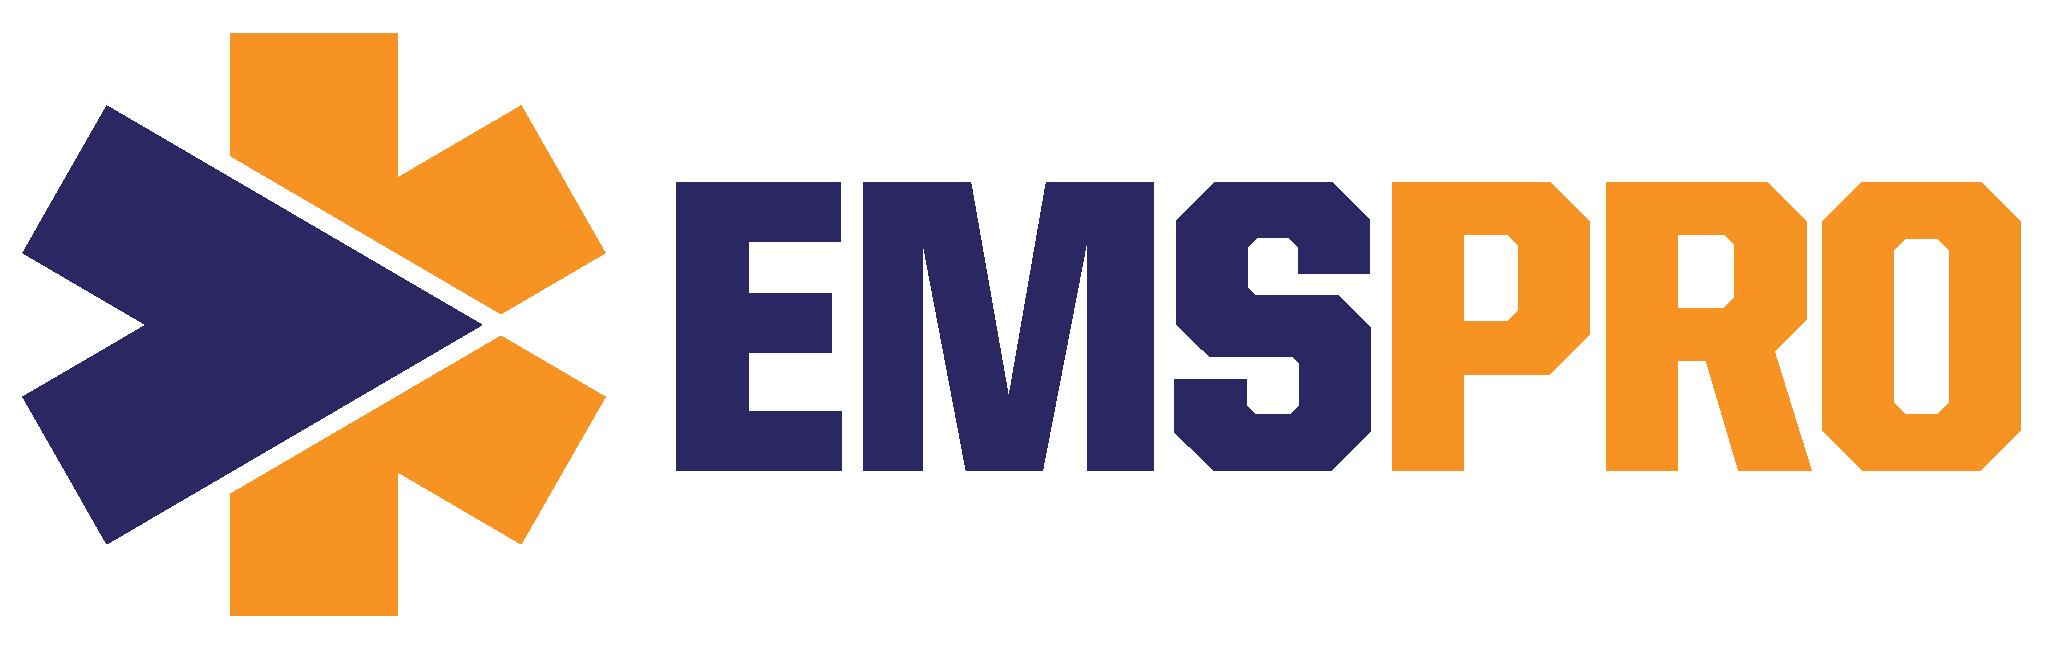 EMS PRO EXPO